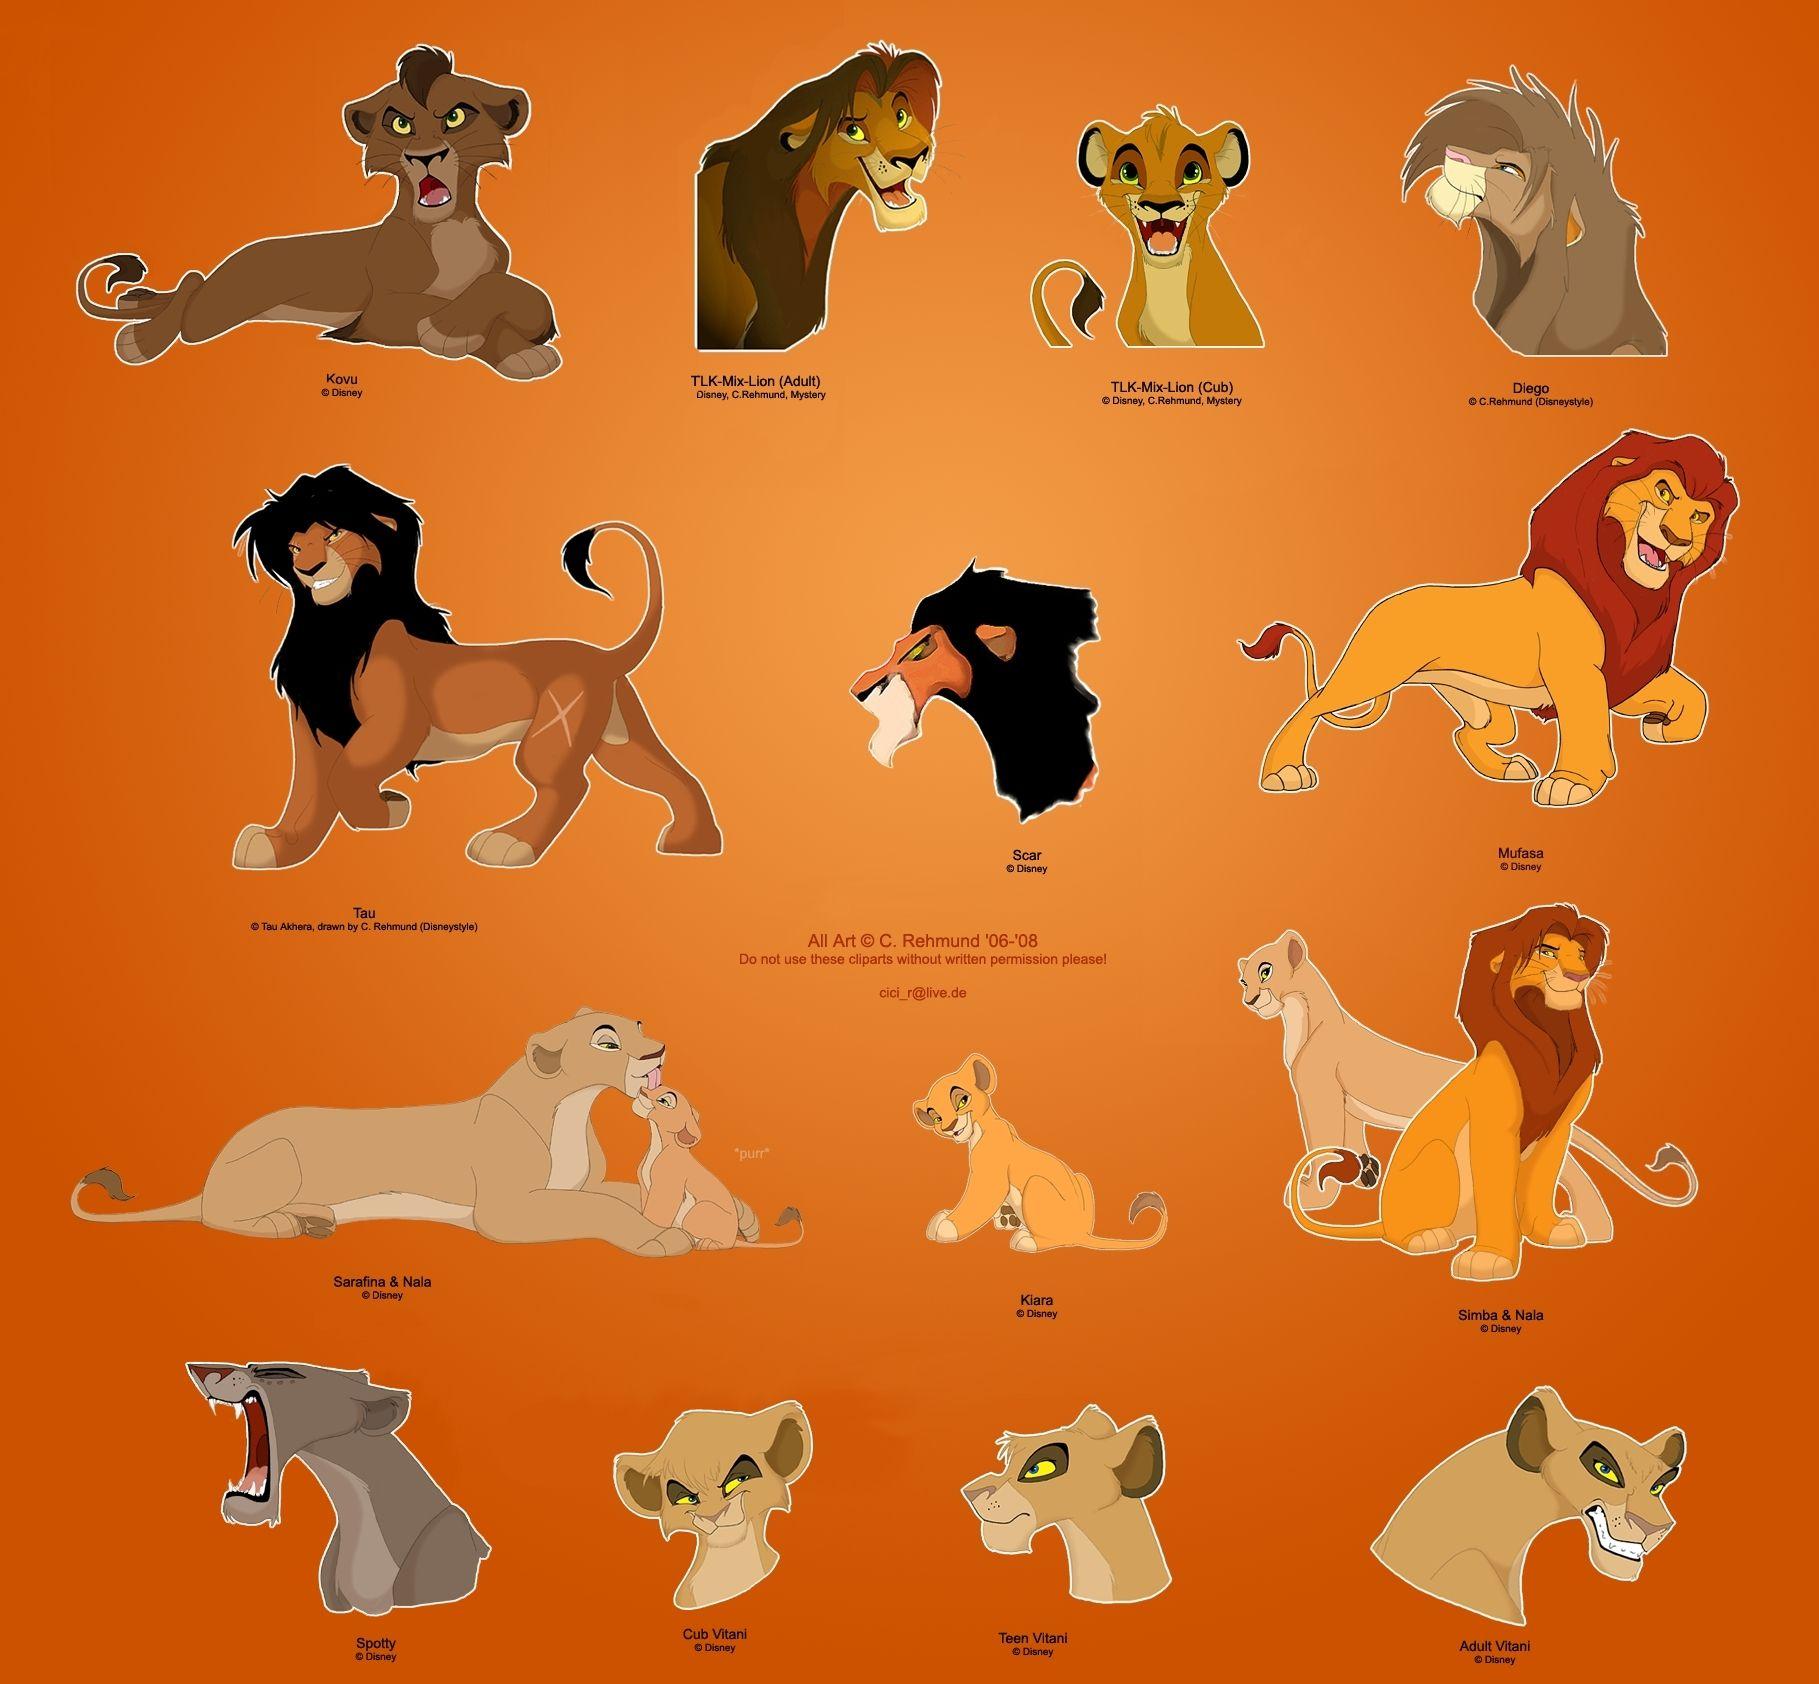 Lion-King-2-the-lion-king-2-simbas-pride-6676568-1819-1684.jpg (1819×1684)